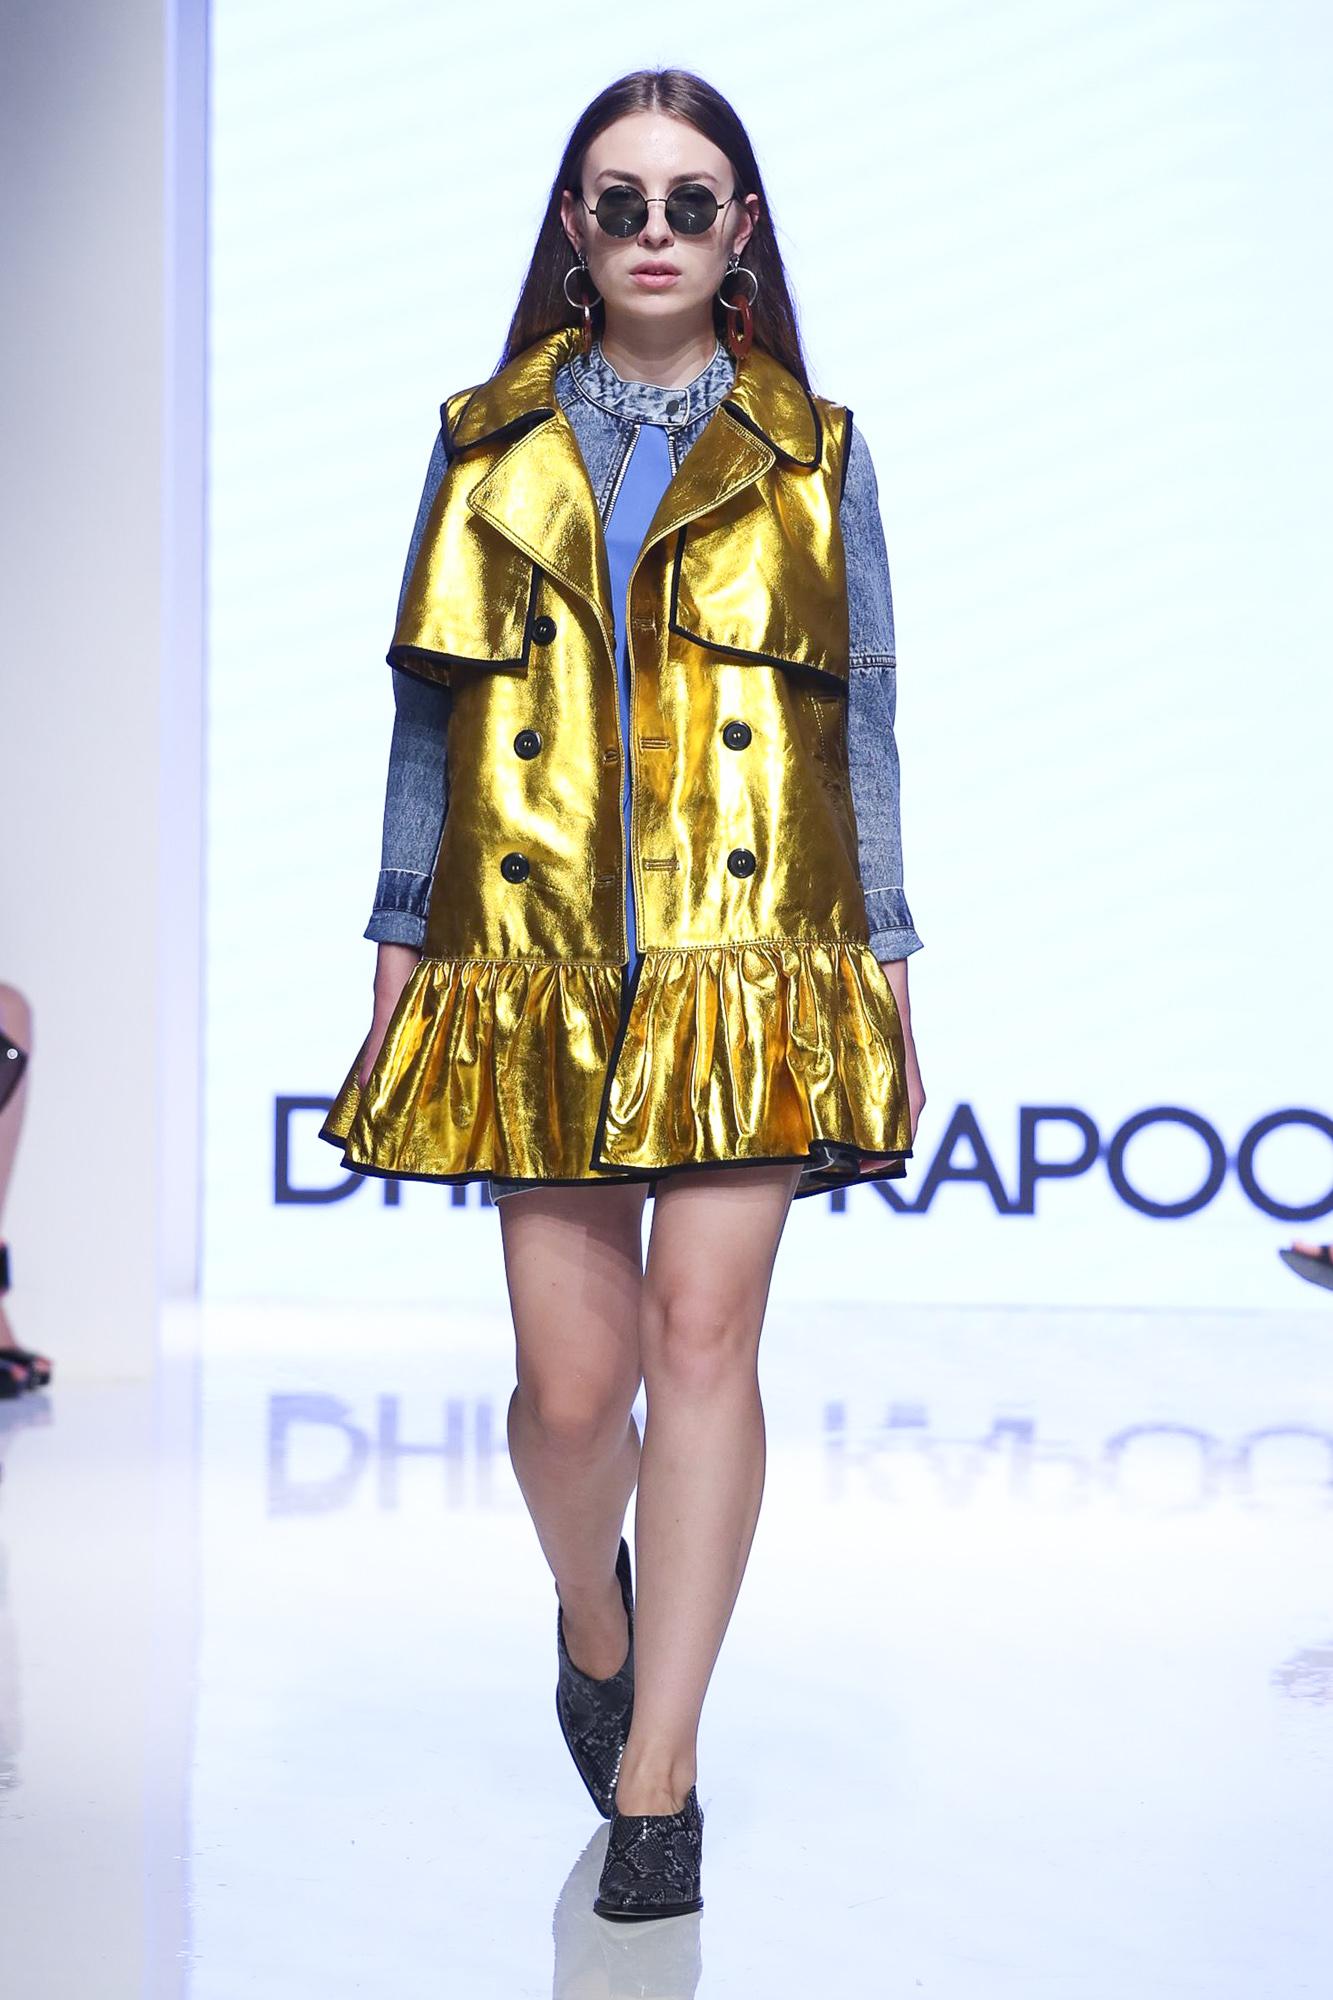 Dhruv Kapoor fashion show, Arab Fashion Week collection Spring Summer 2020 in Dubai